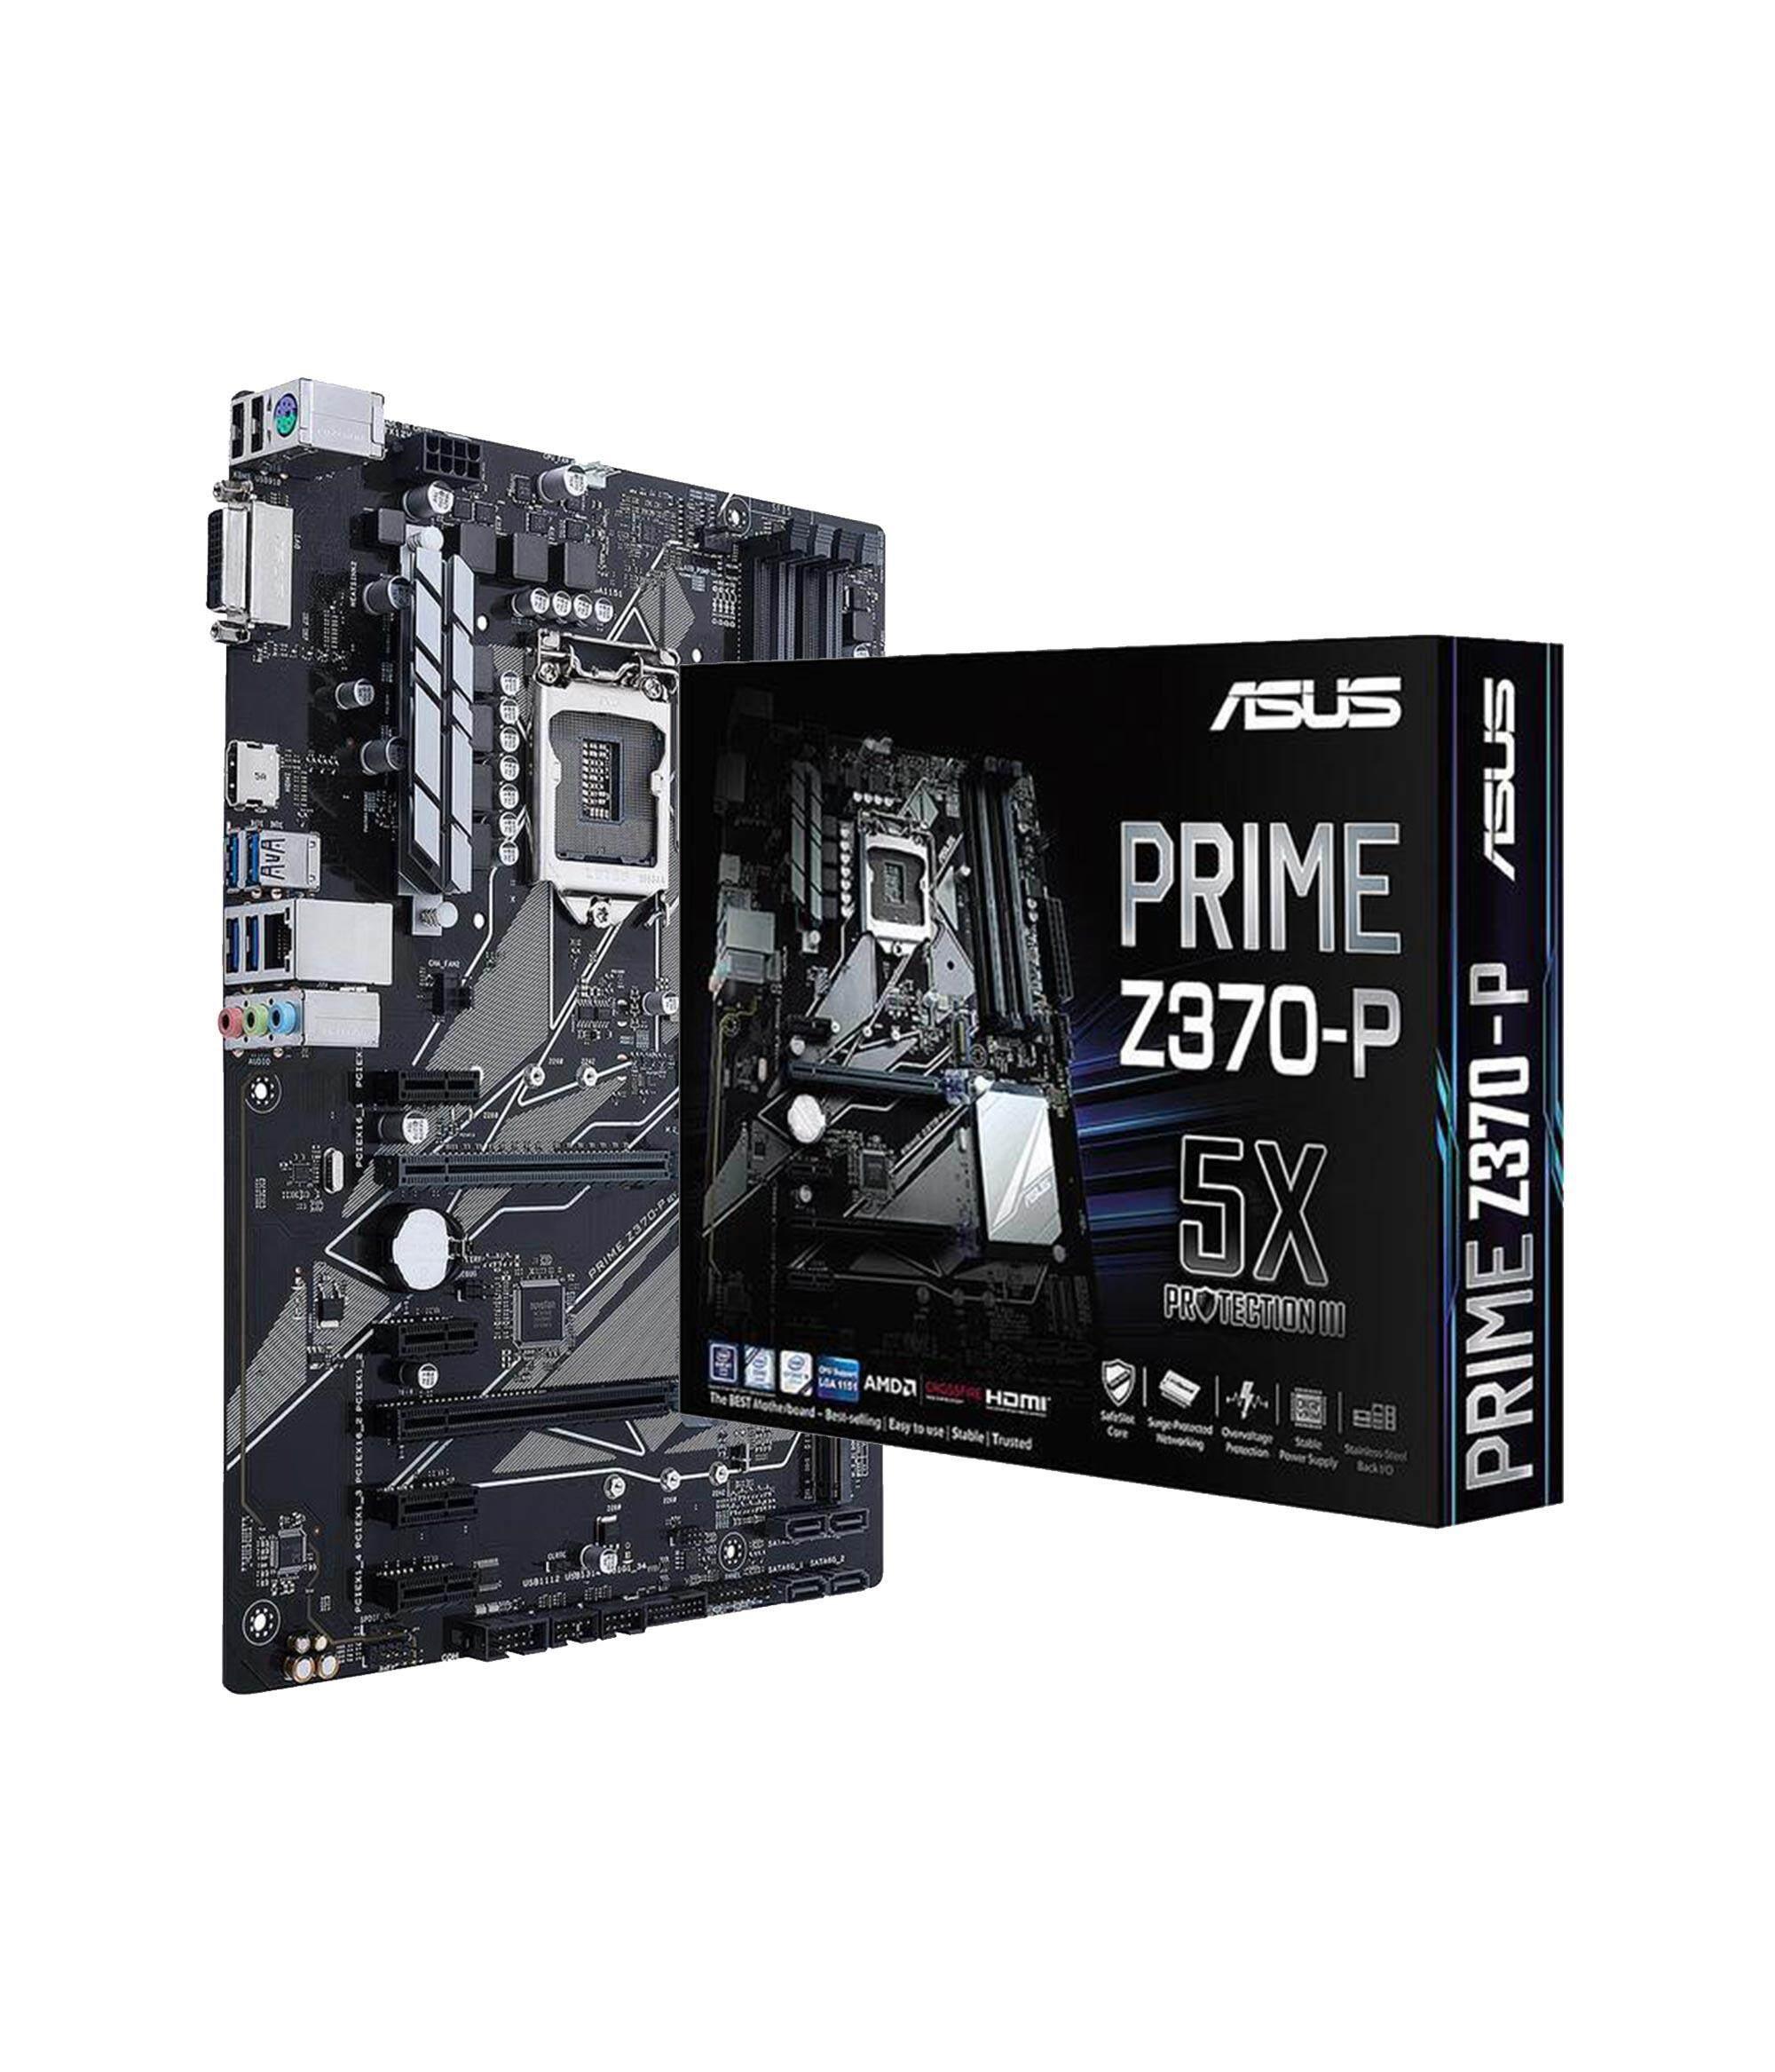 ASUS PRIME Z370-P Motherboard + Intel Core i7-8th Gen 8700 Desktop Processor (Complete Set)